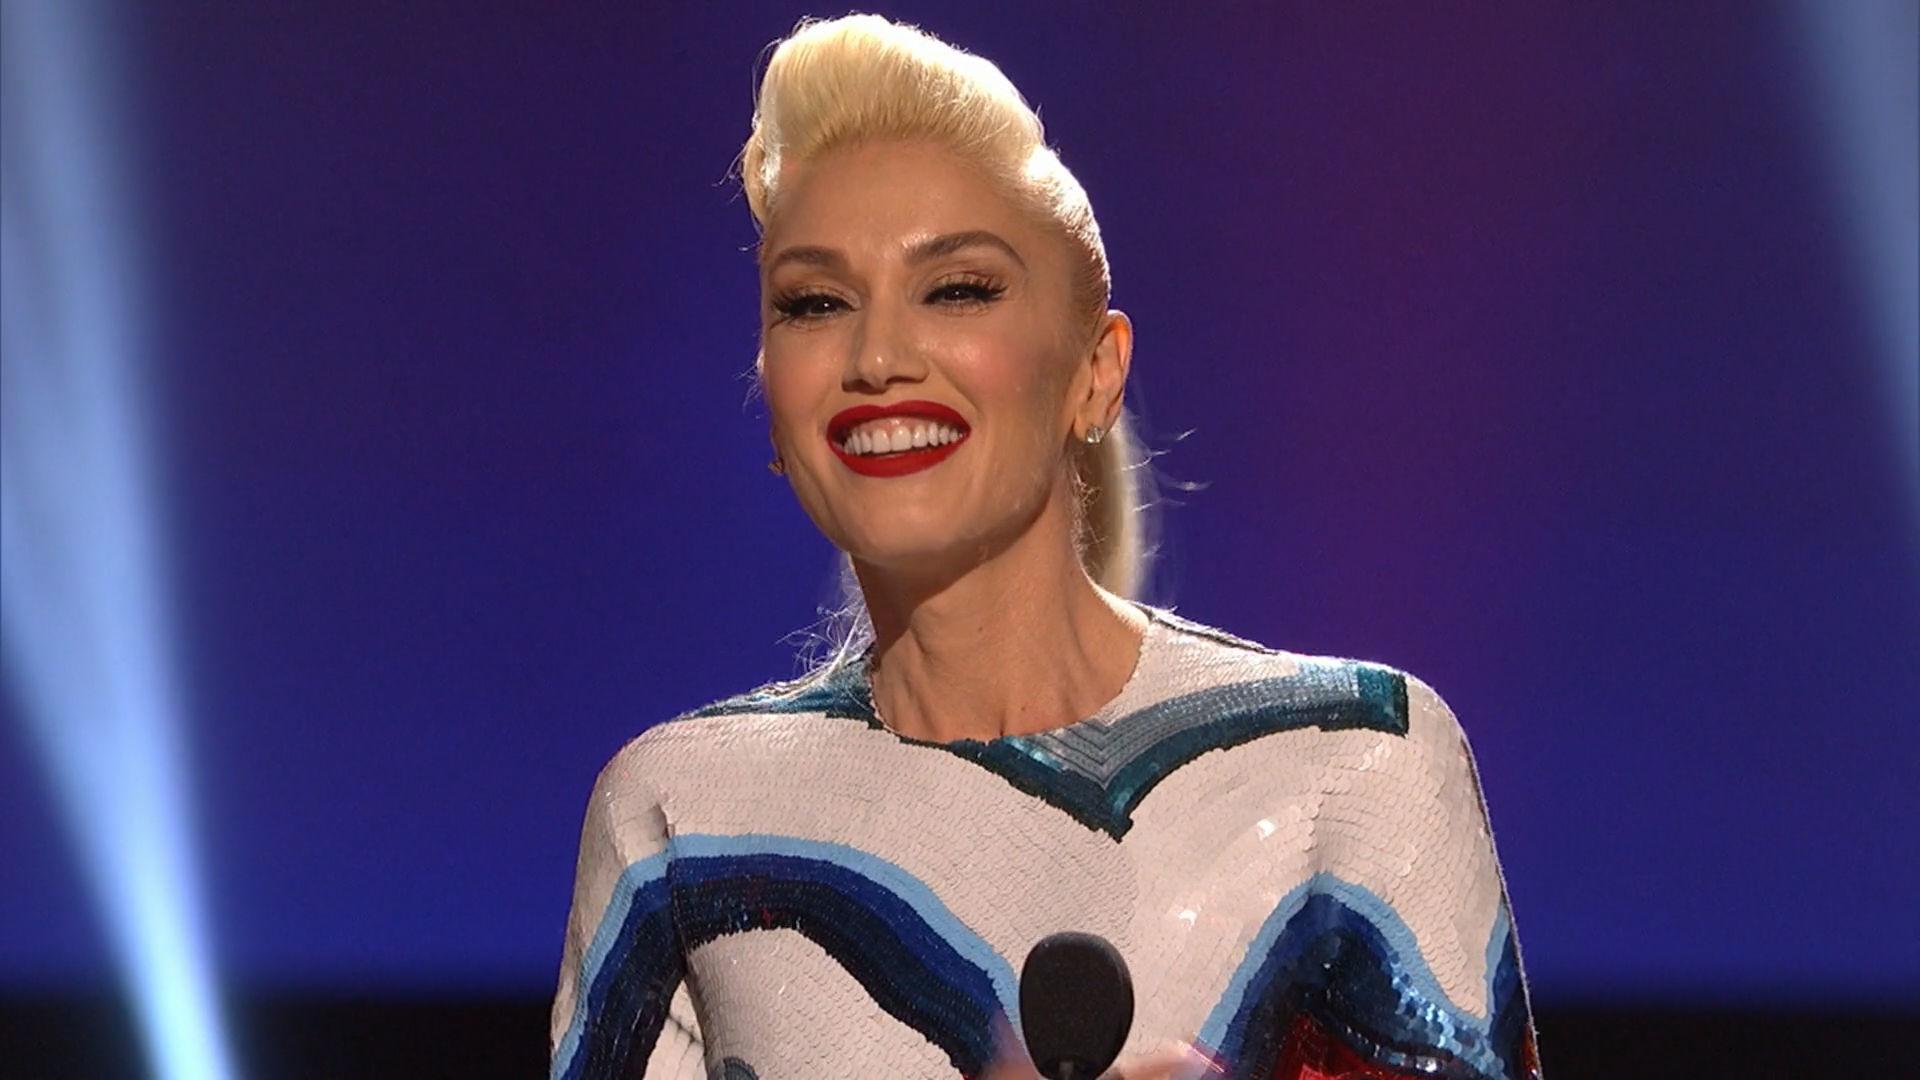 Gwen Stefani Hero Award at the 2016 RDMA | Radio Disney Music Awards | Radio Disney